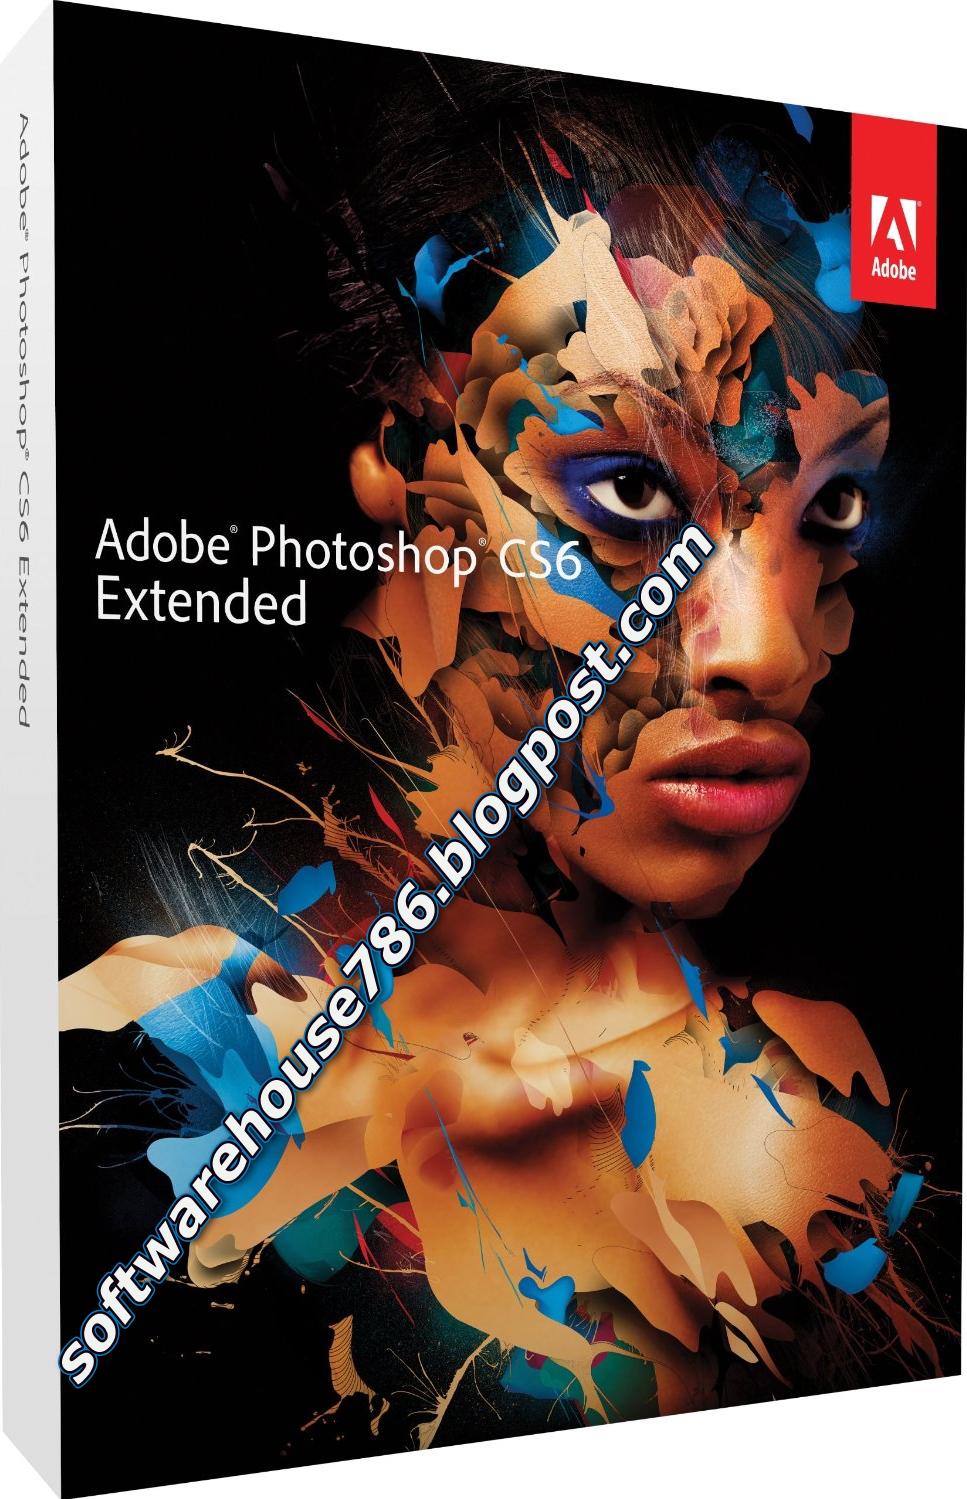 How to get Adobe Photoshop CS6 (32 & 64Bit) Full version ...